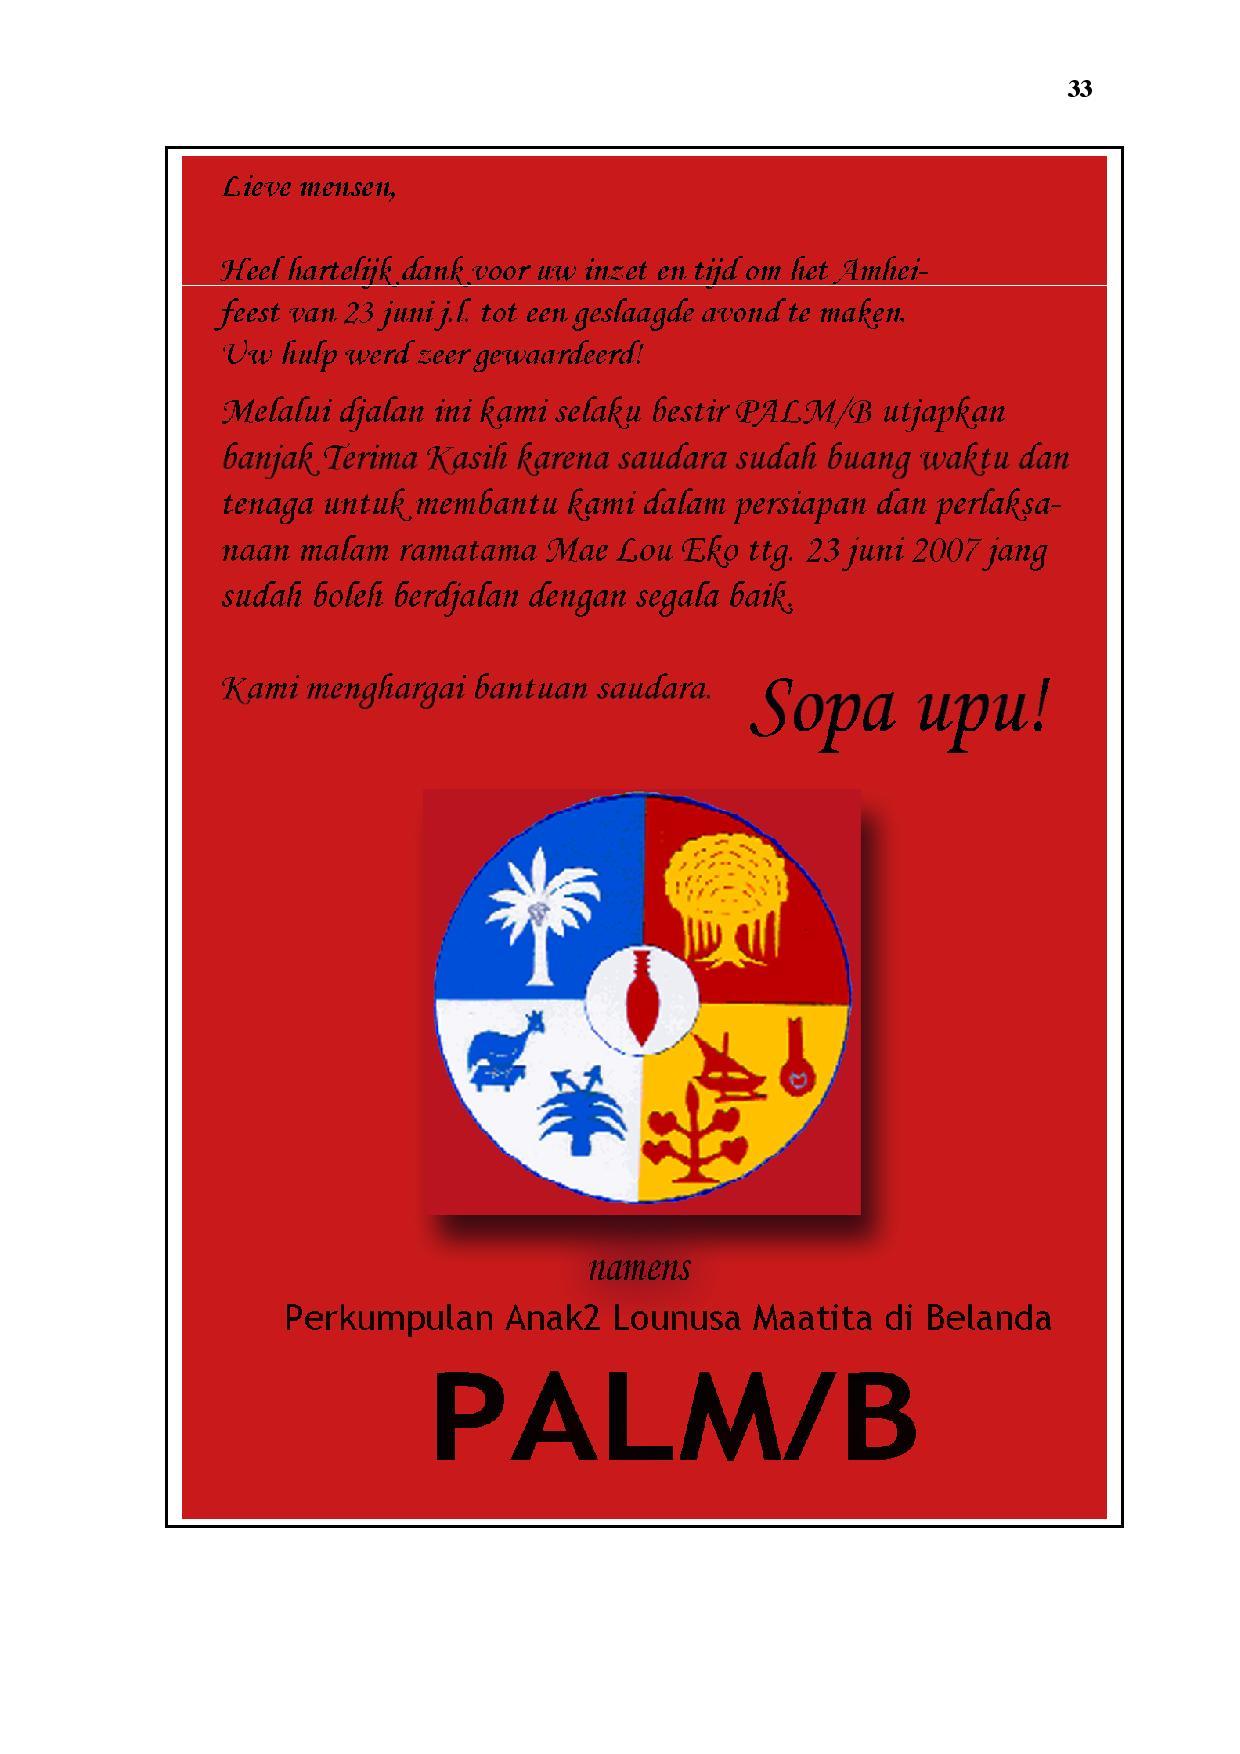 Saka Mese 3e jaargang nr. 02-2007 definitieve webversie-page-033